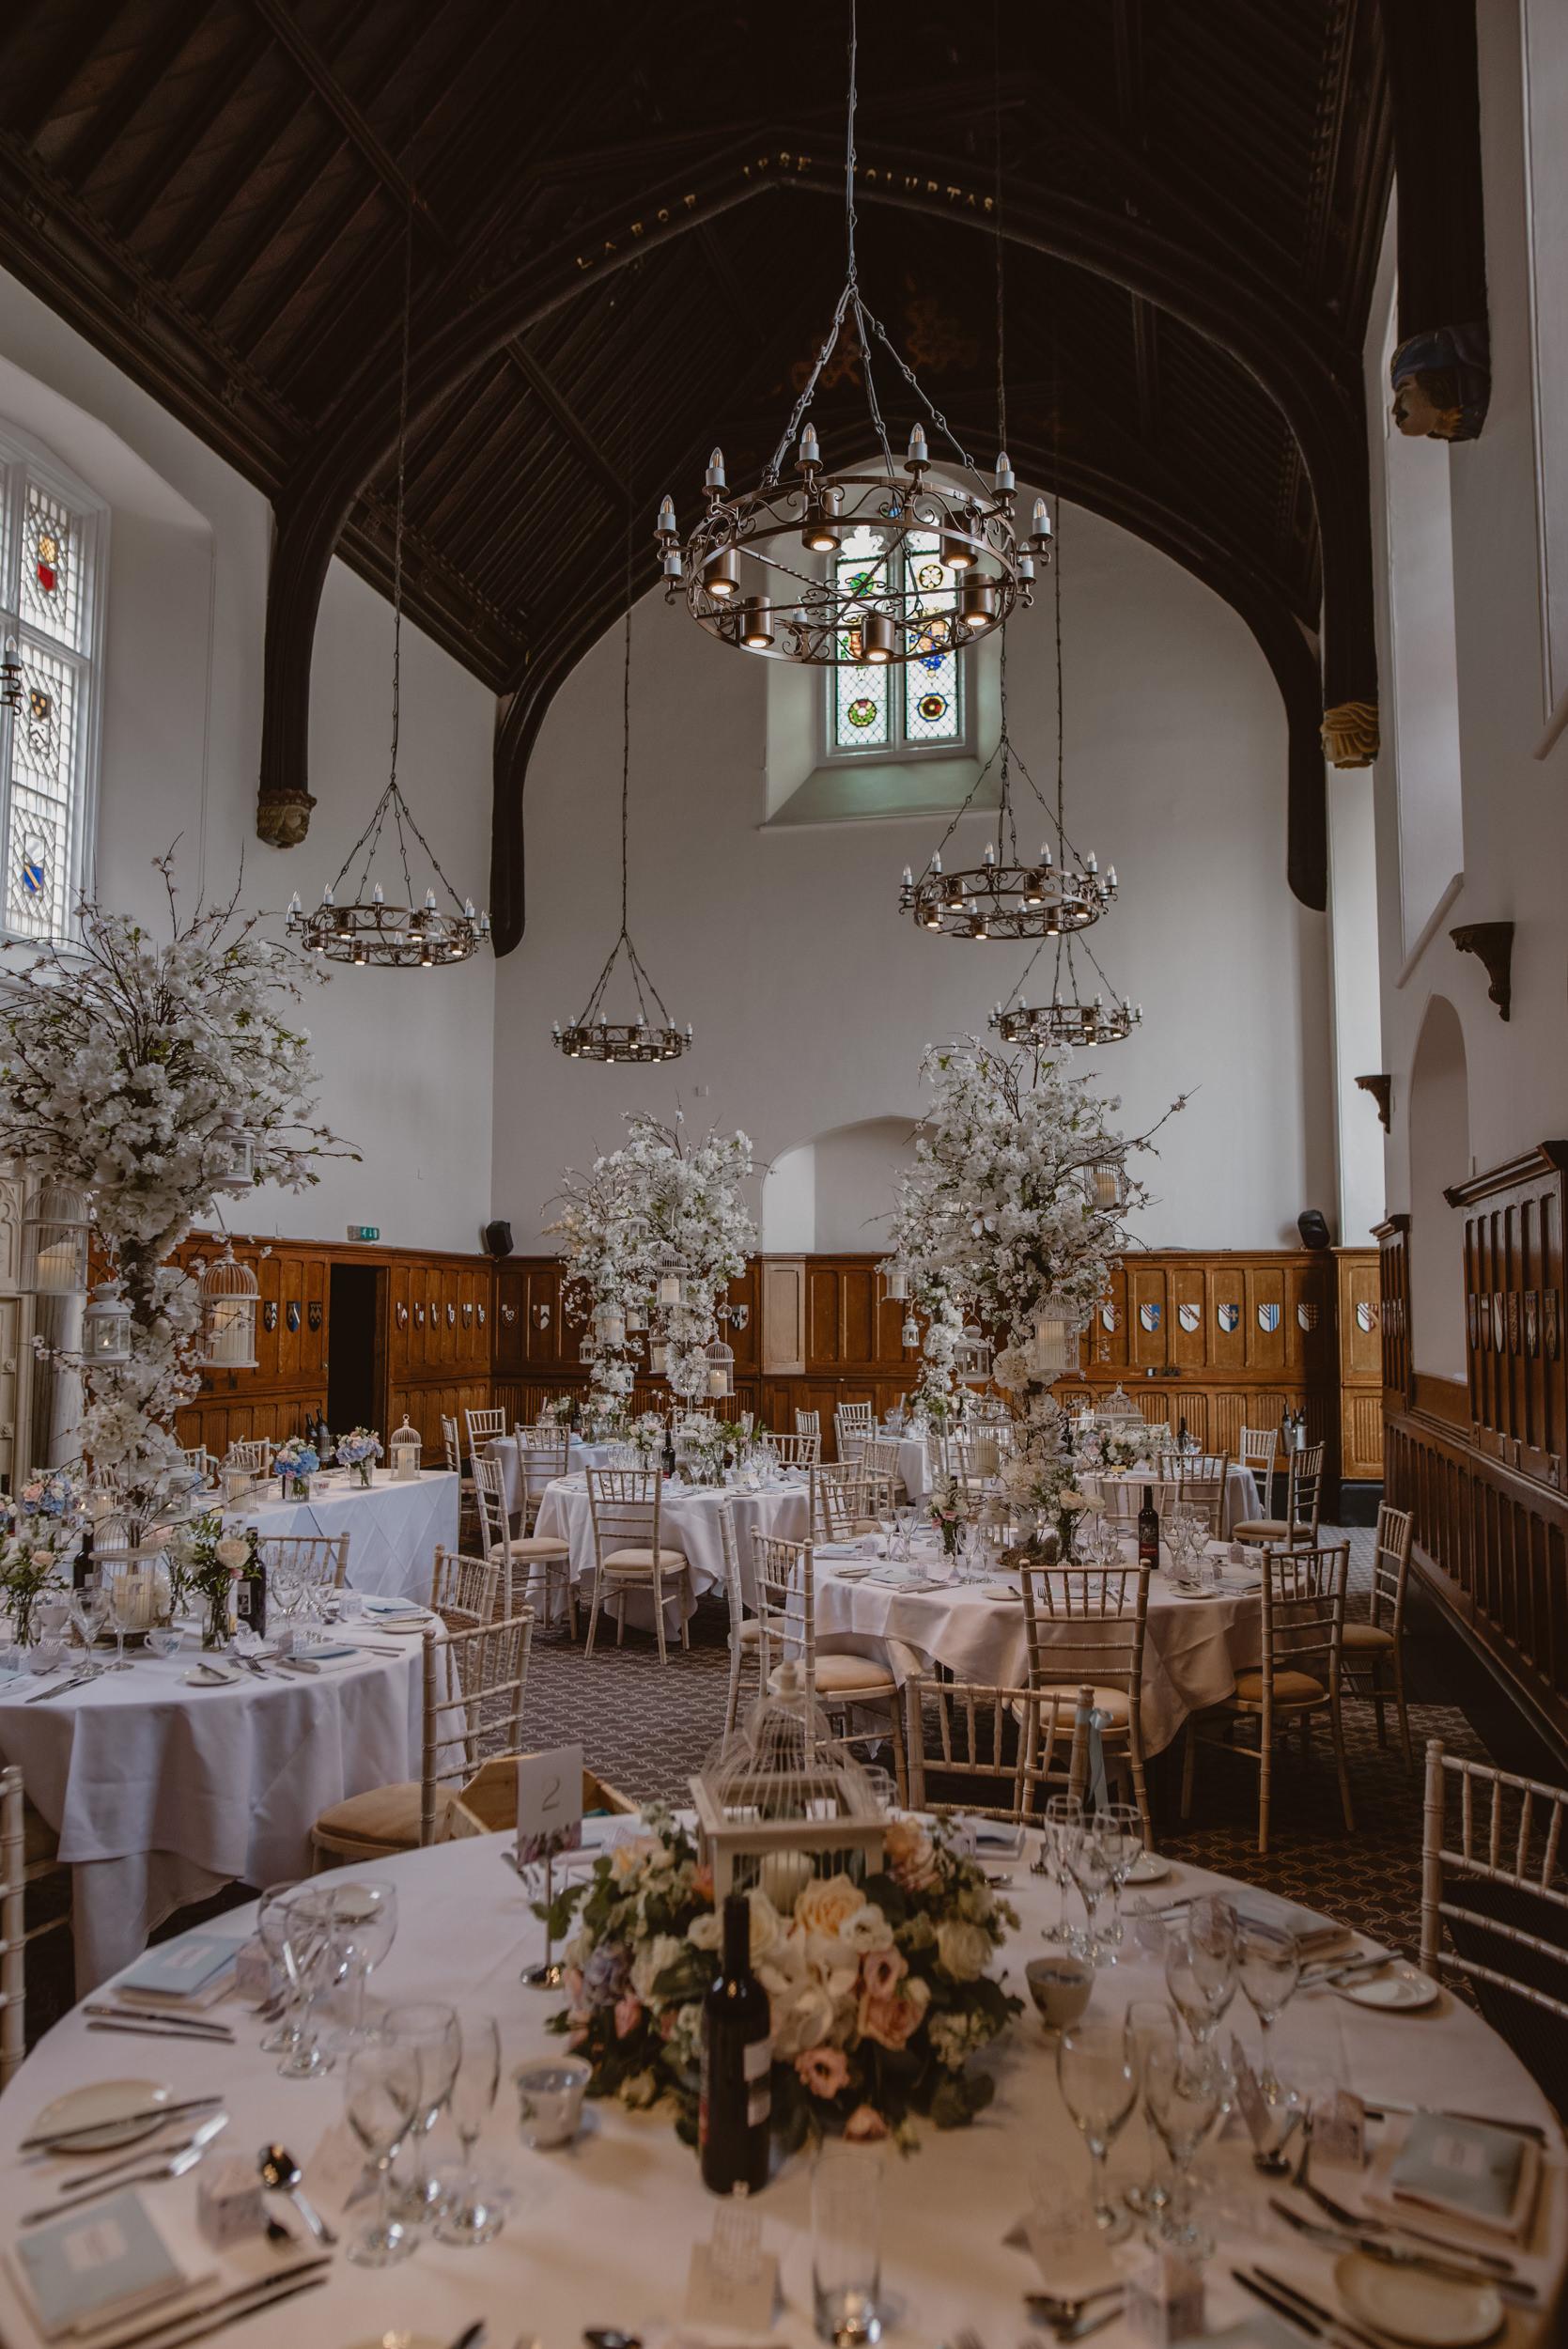 Rachel-and-James-Wedding-Horsley-Towers-State-Manu-Mendoza-Wedding-Photography-358.jpg